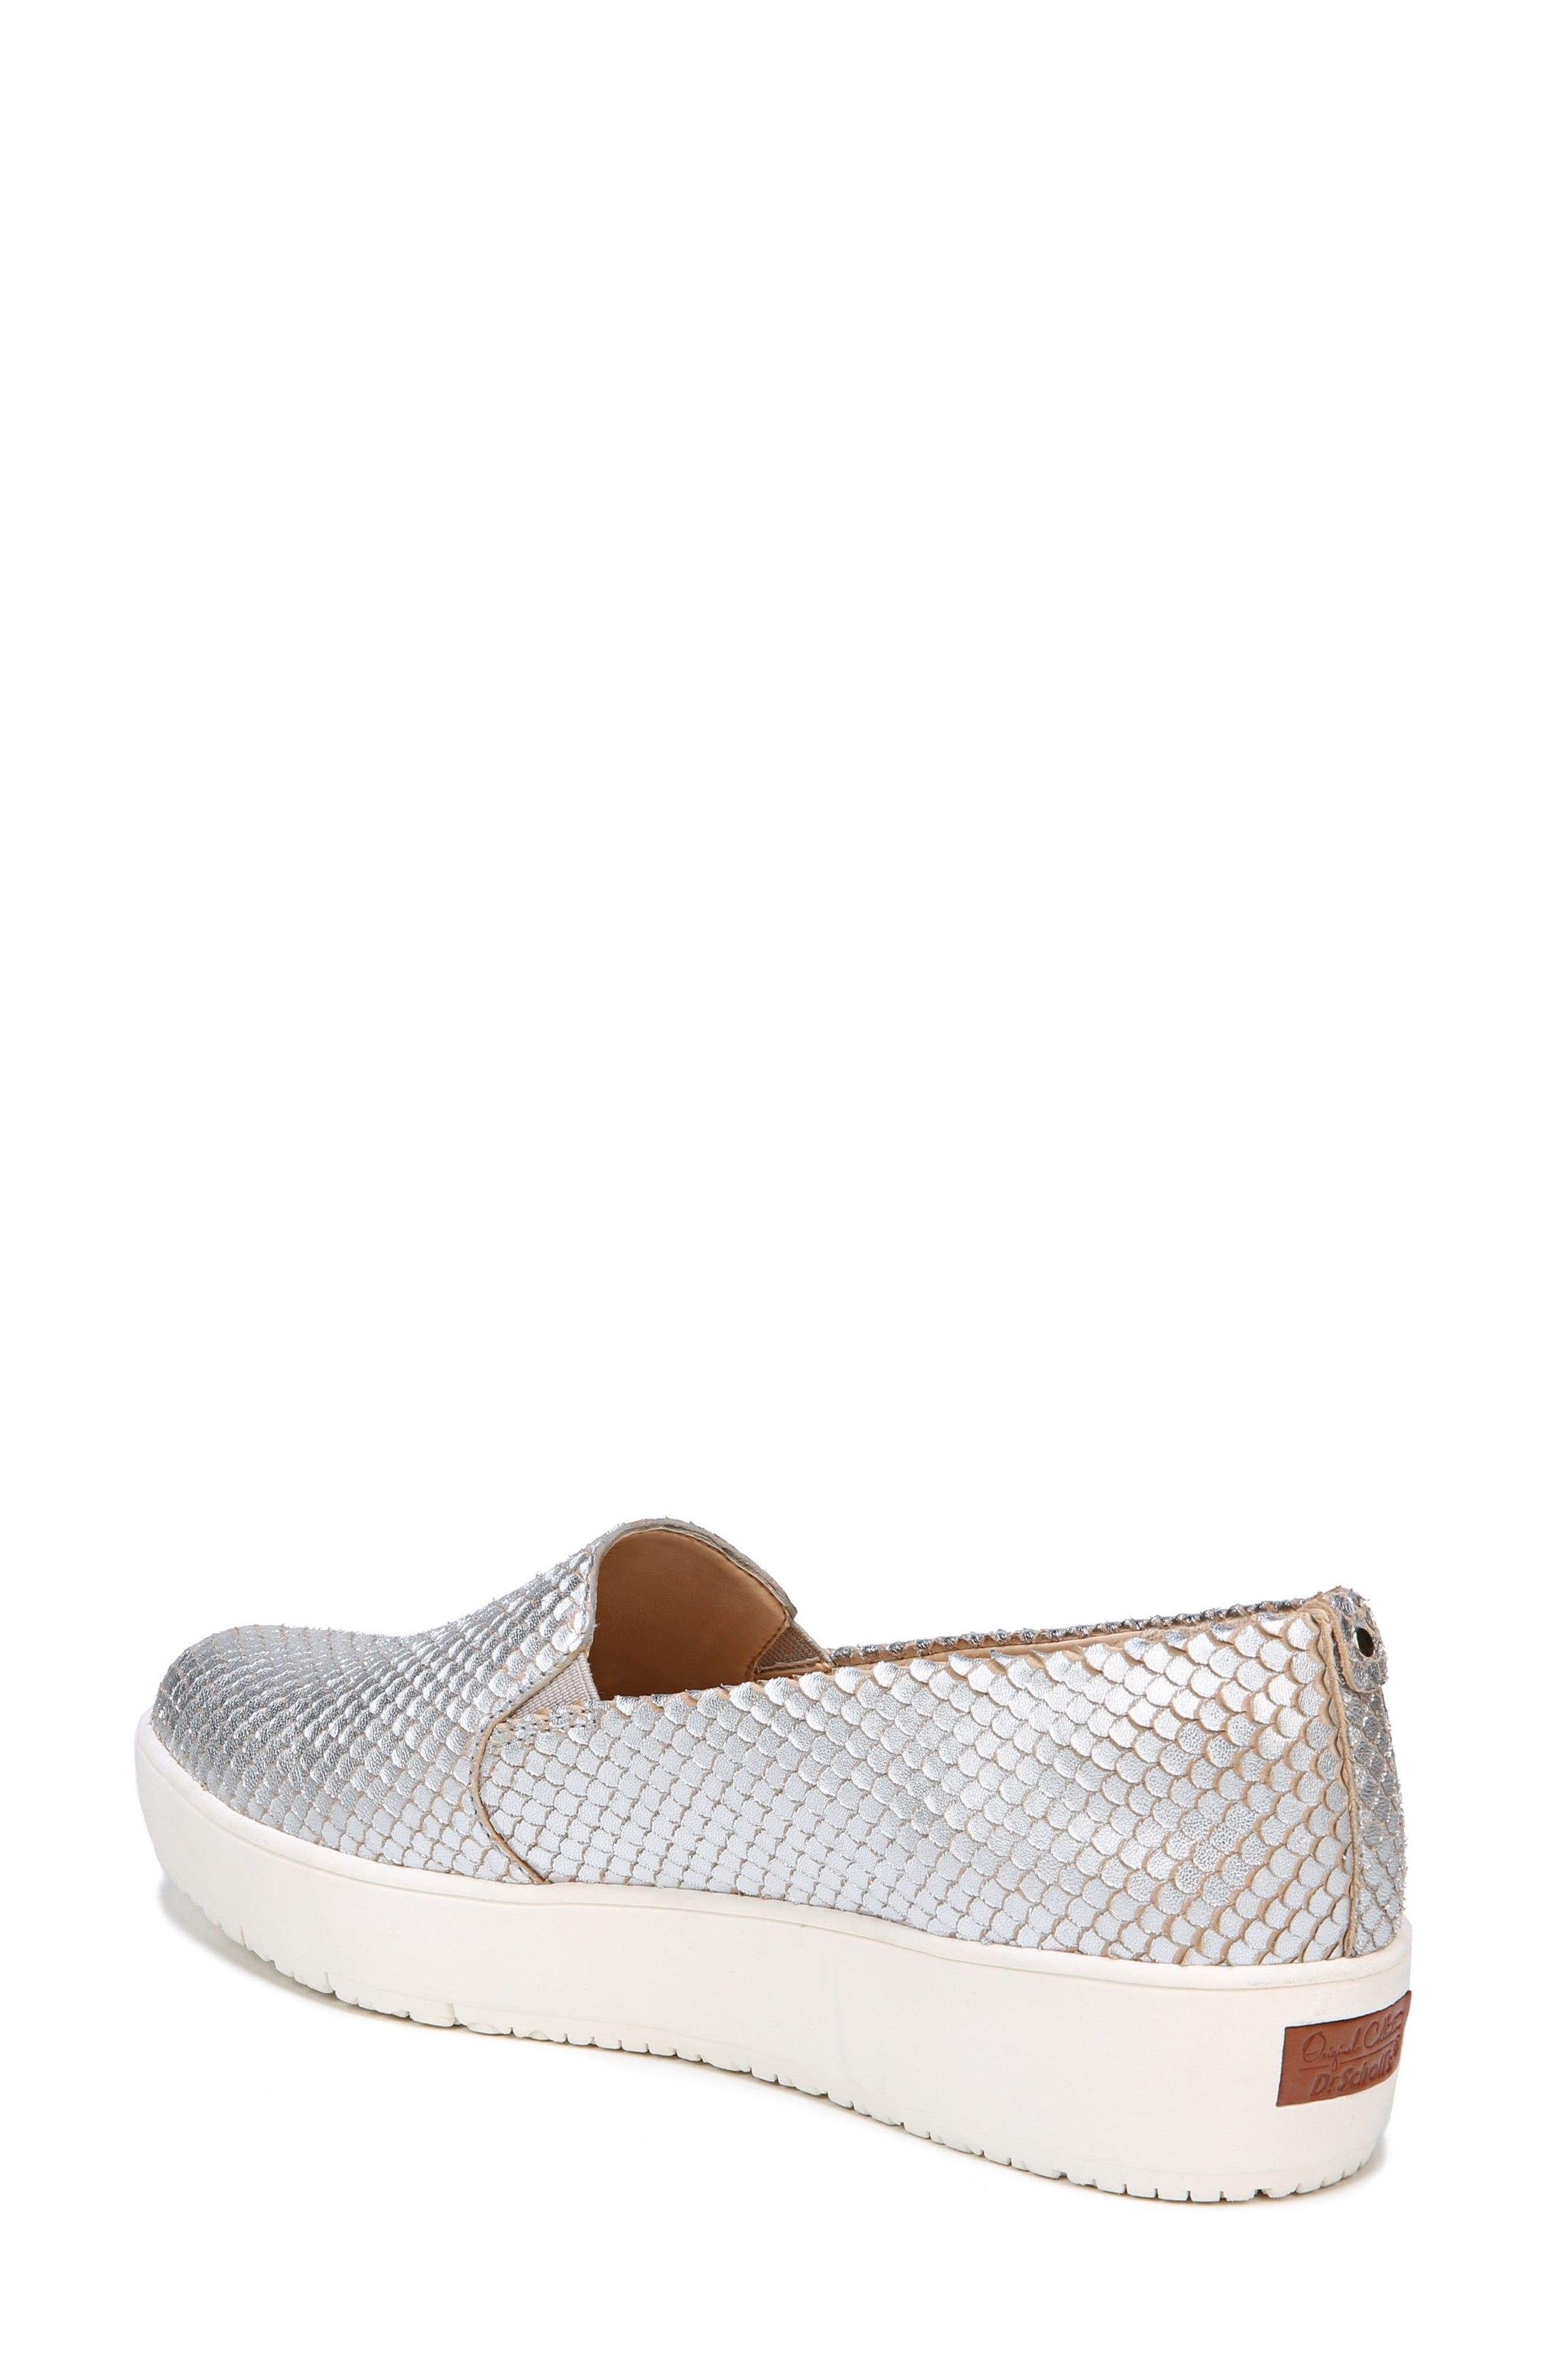 Bradyn Slip-On Sneaker,                             Alternate thumbnail 2, color,                             Silver Leather